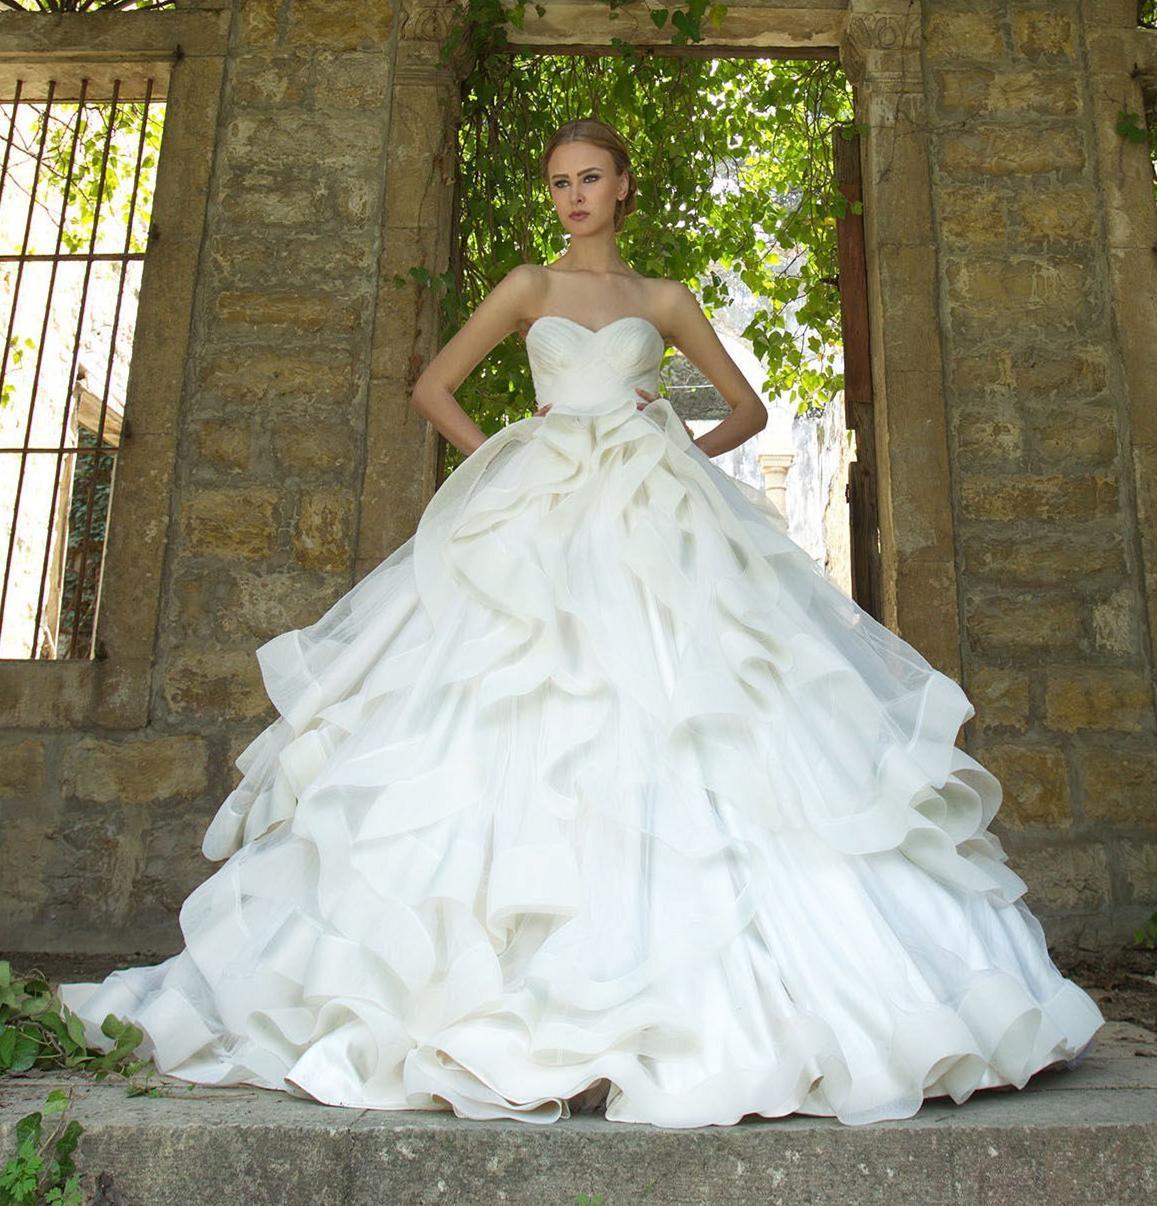 Discount 2017 Pnina Tornai Ball Gown Wedding Dresses High